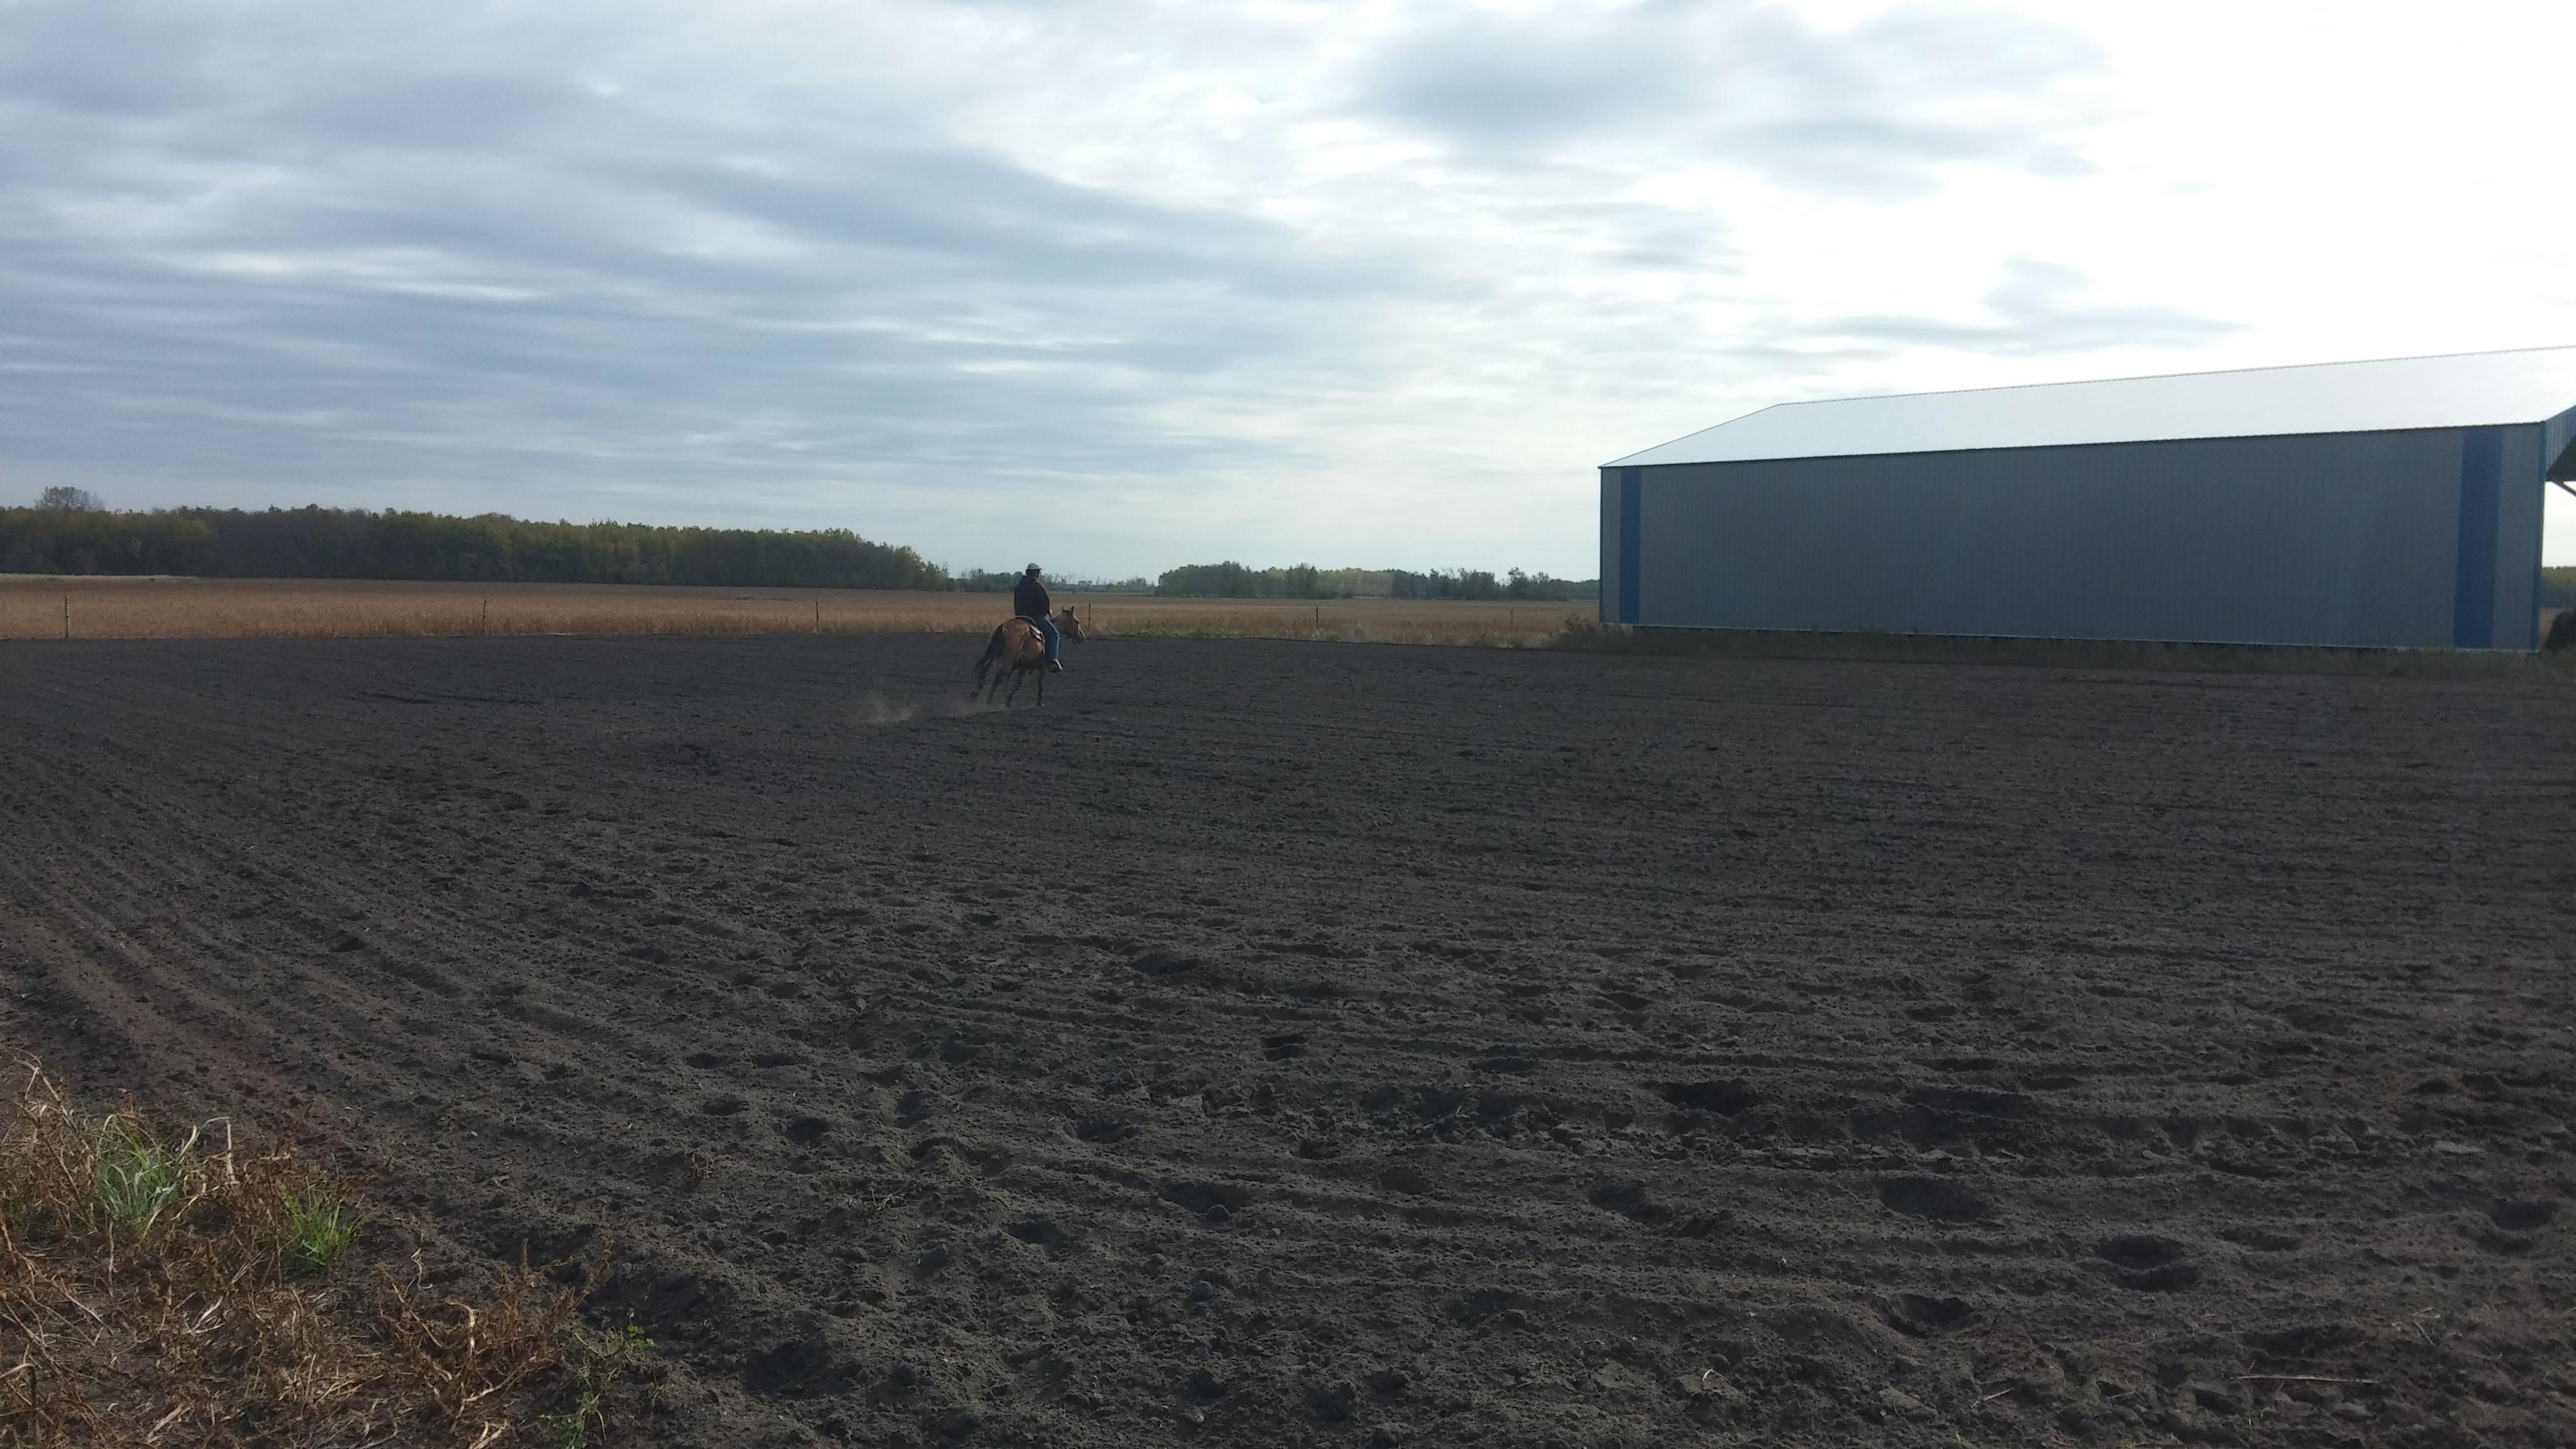 Future location of outdoor arena